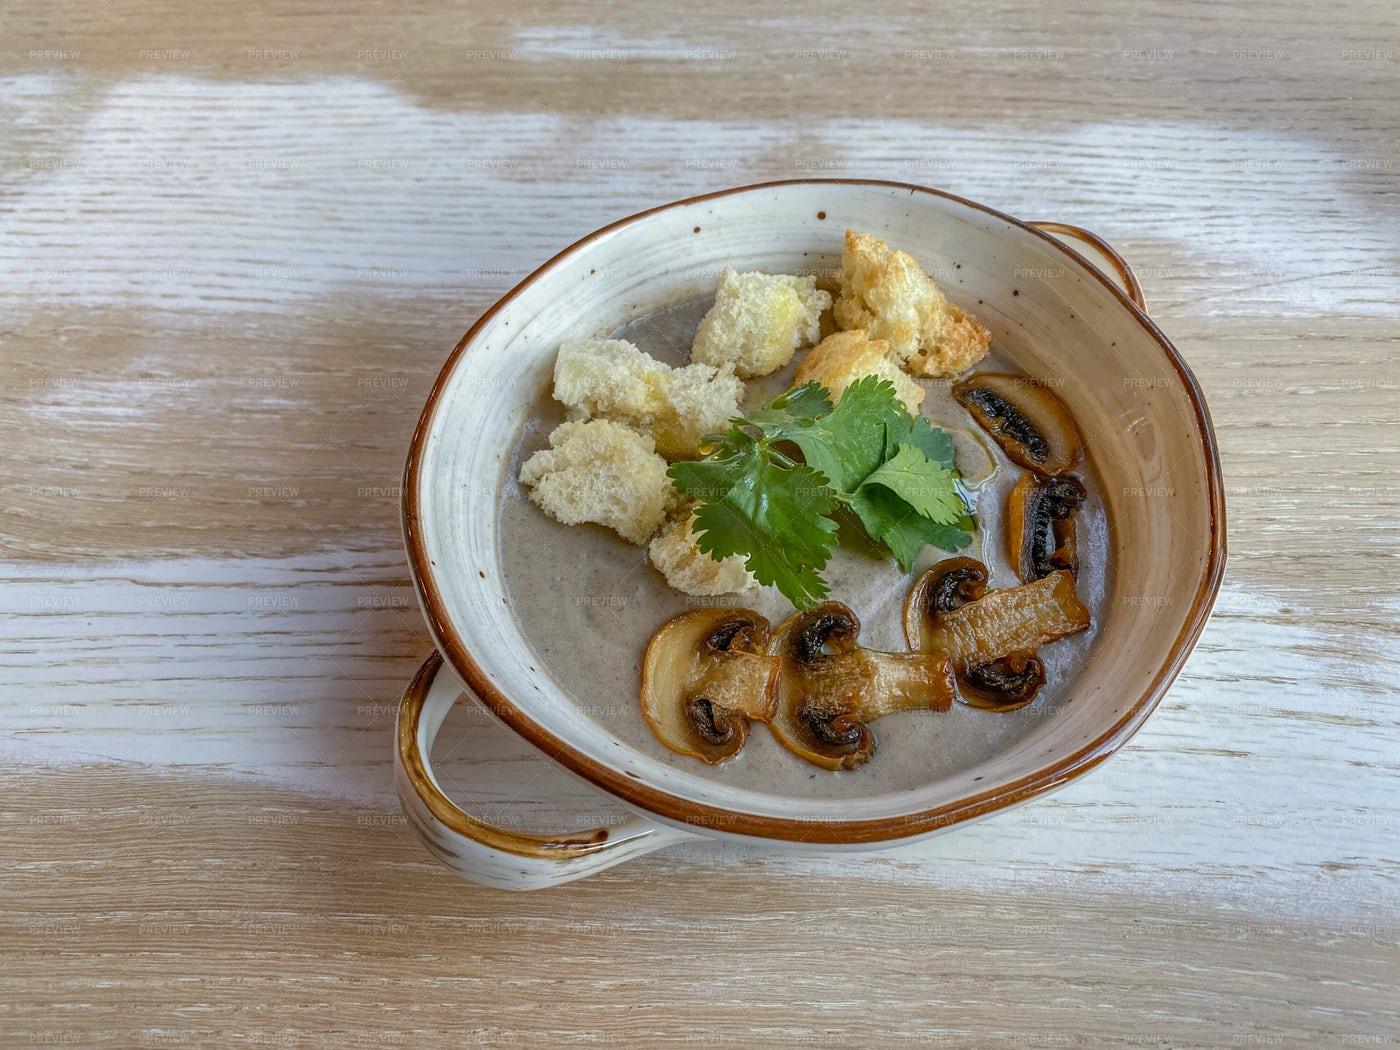 Cream Soup With Mushroom: Stock Photos